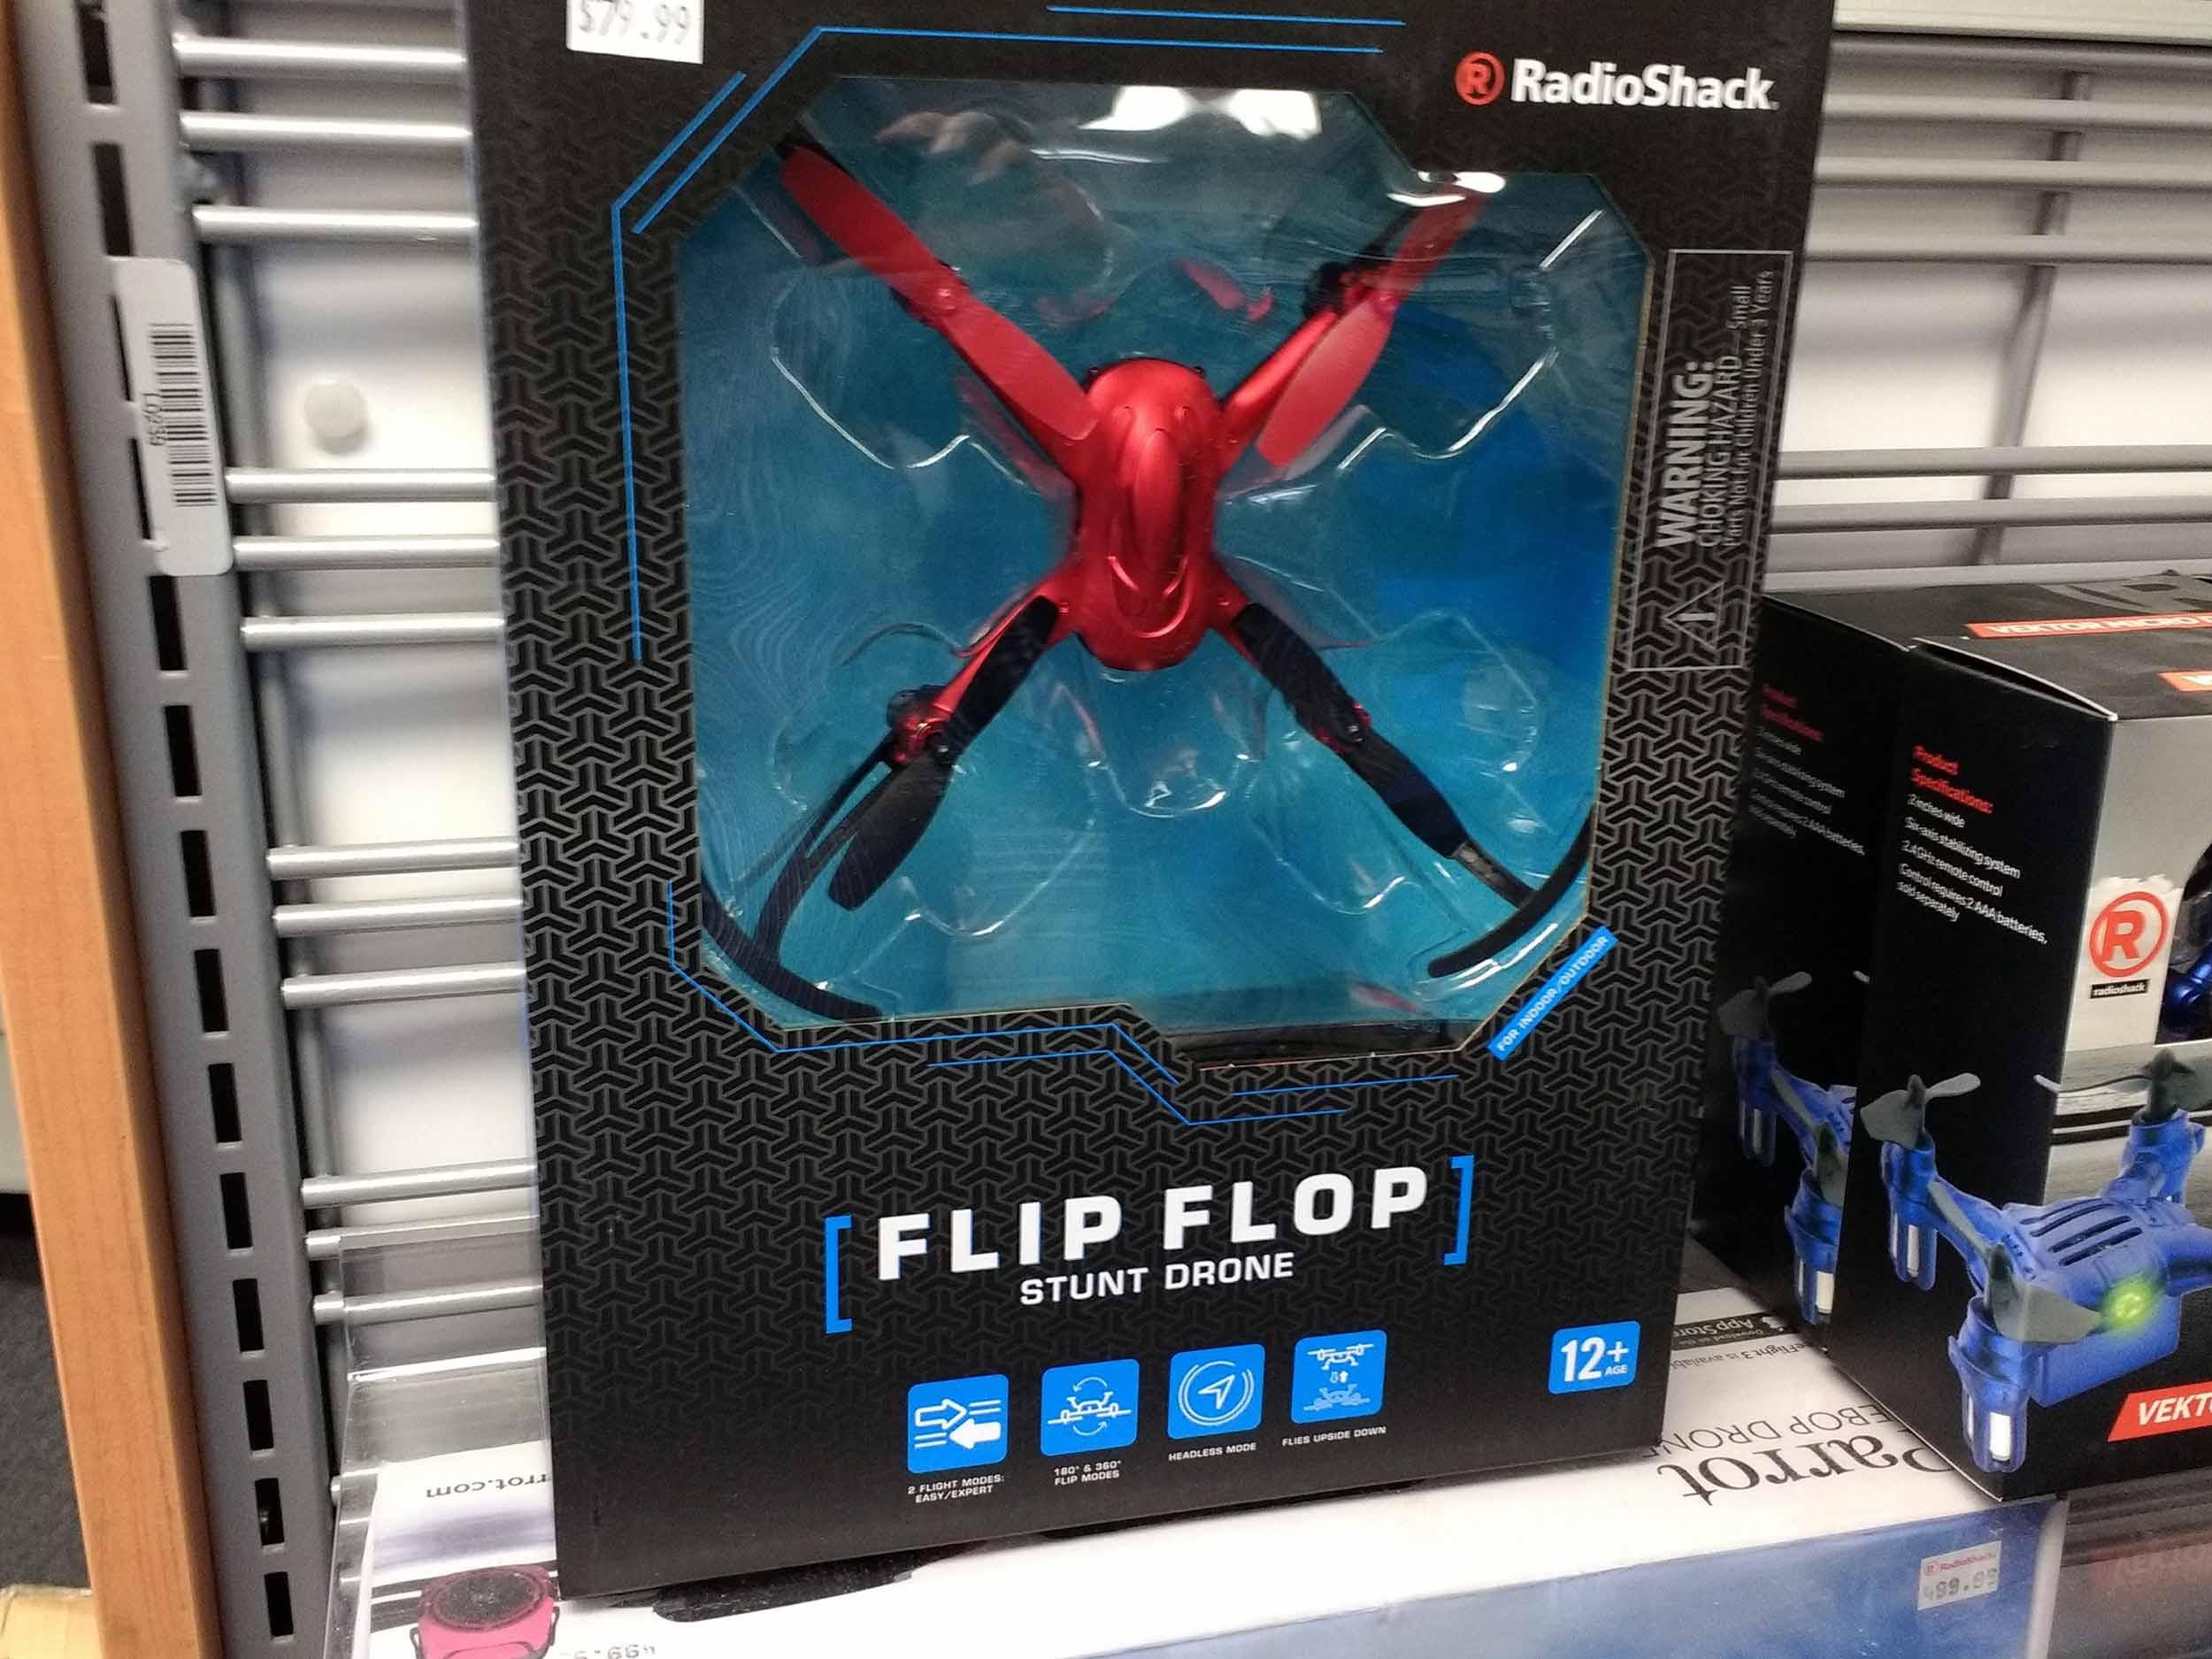 Flip flop drone provides aerial acrobatics.